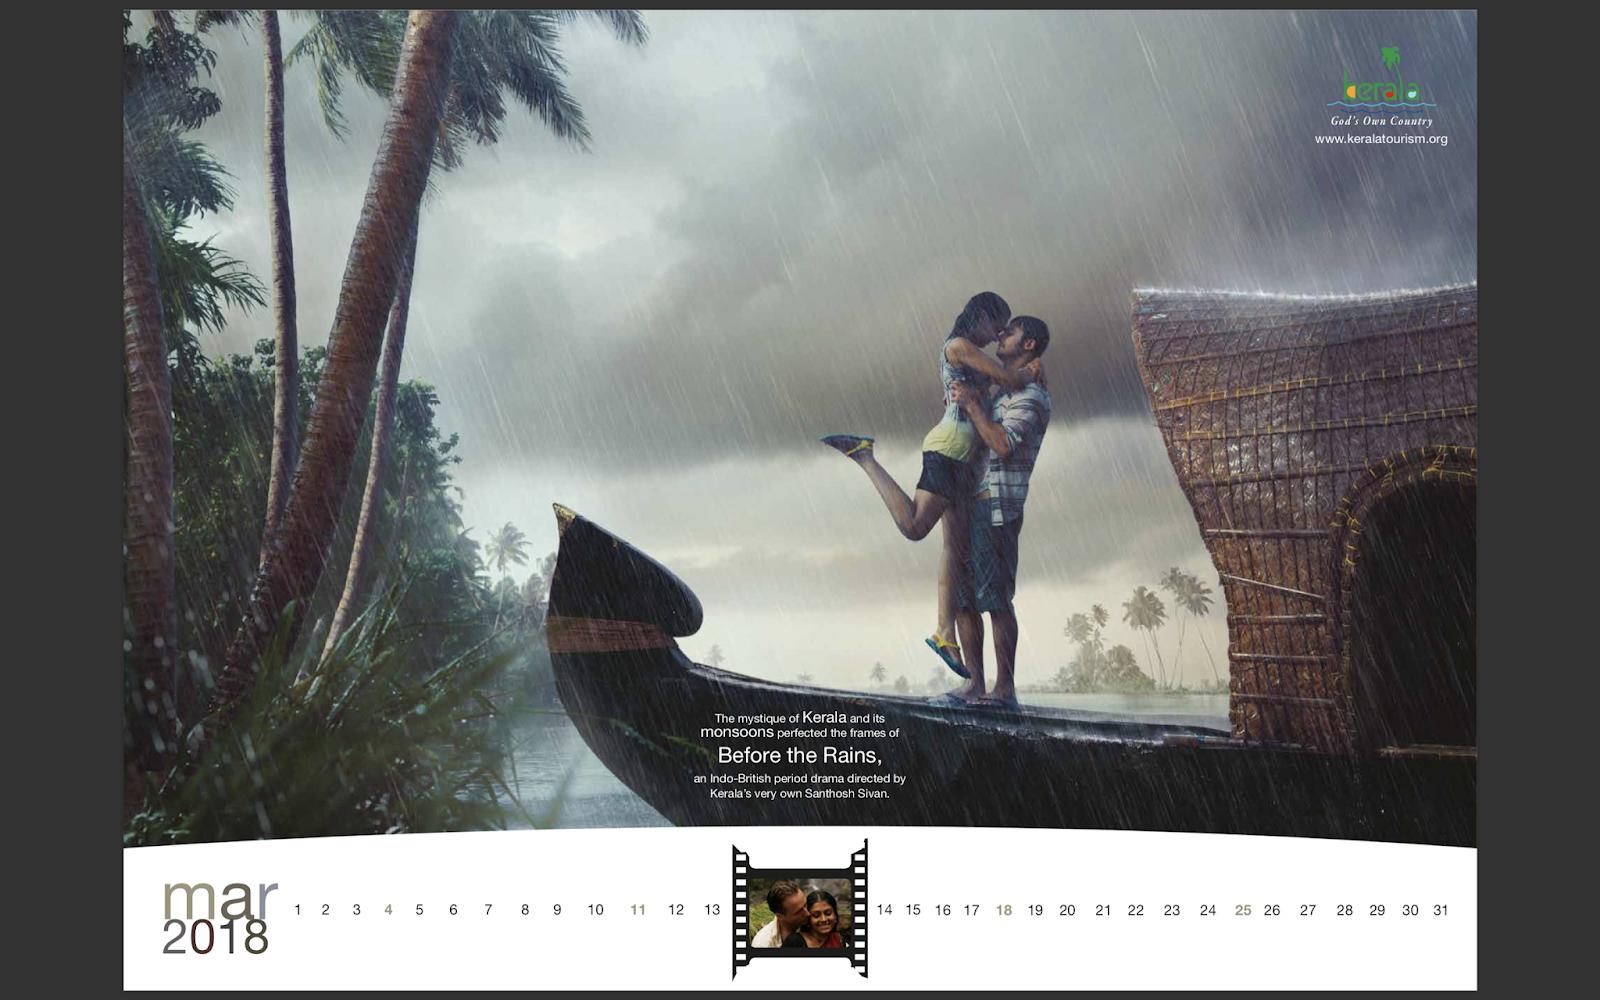 Kerala Tourism 2018 Calendar mock-up 4 | Stark Communications Pvt Ltd